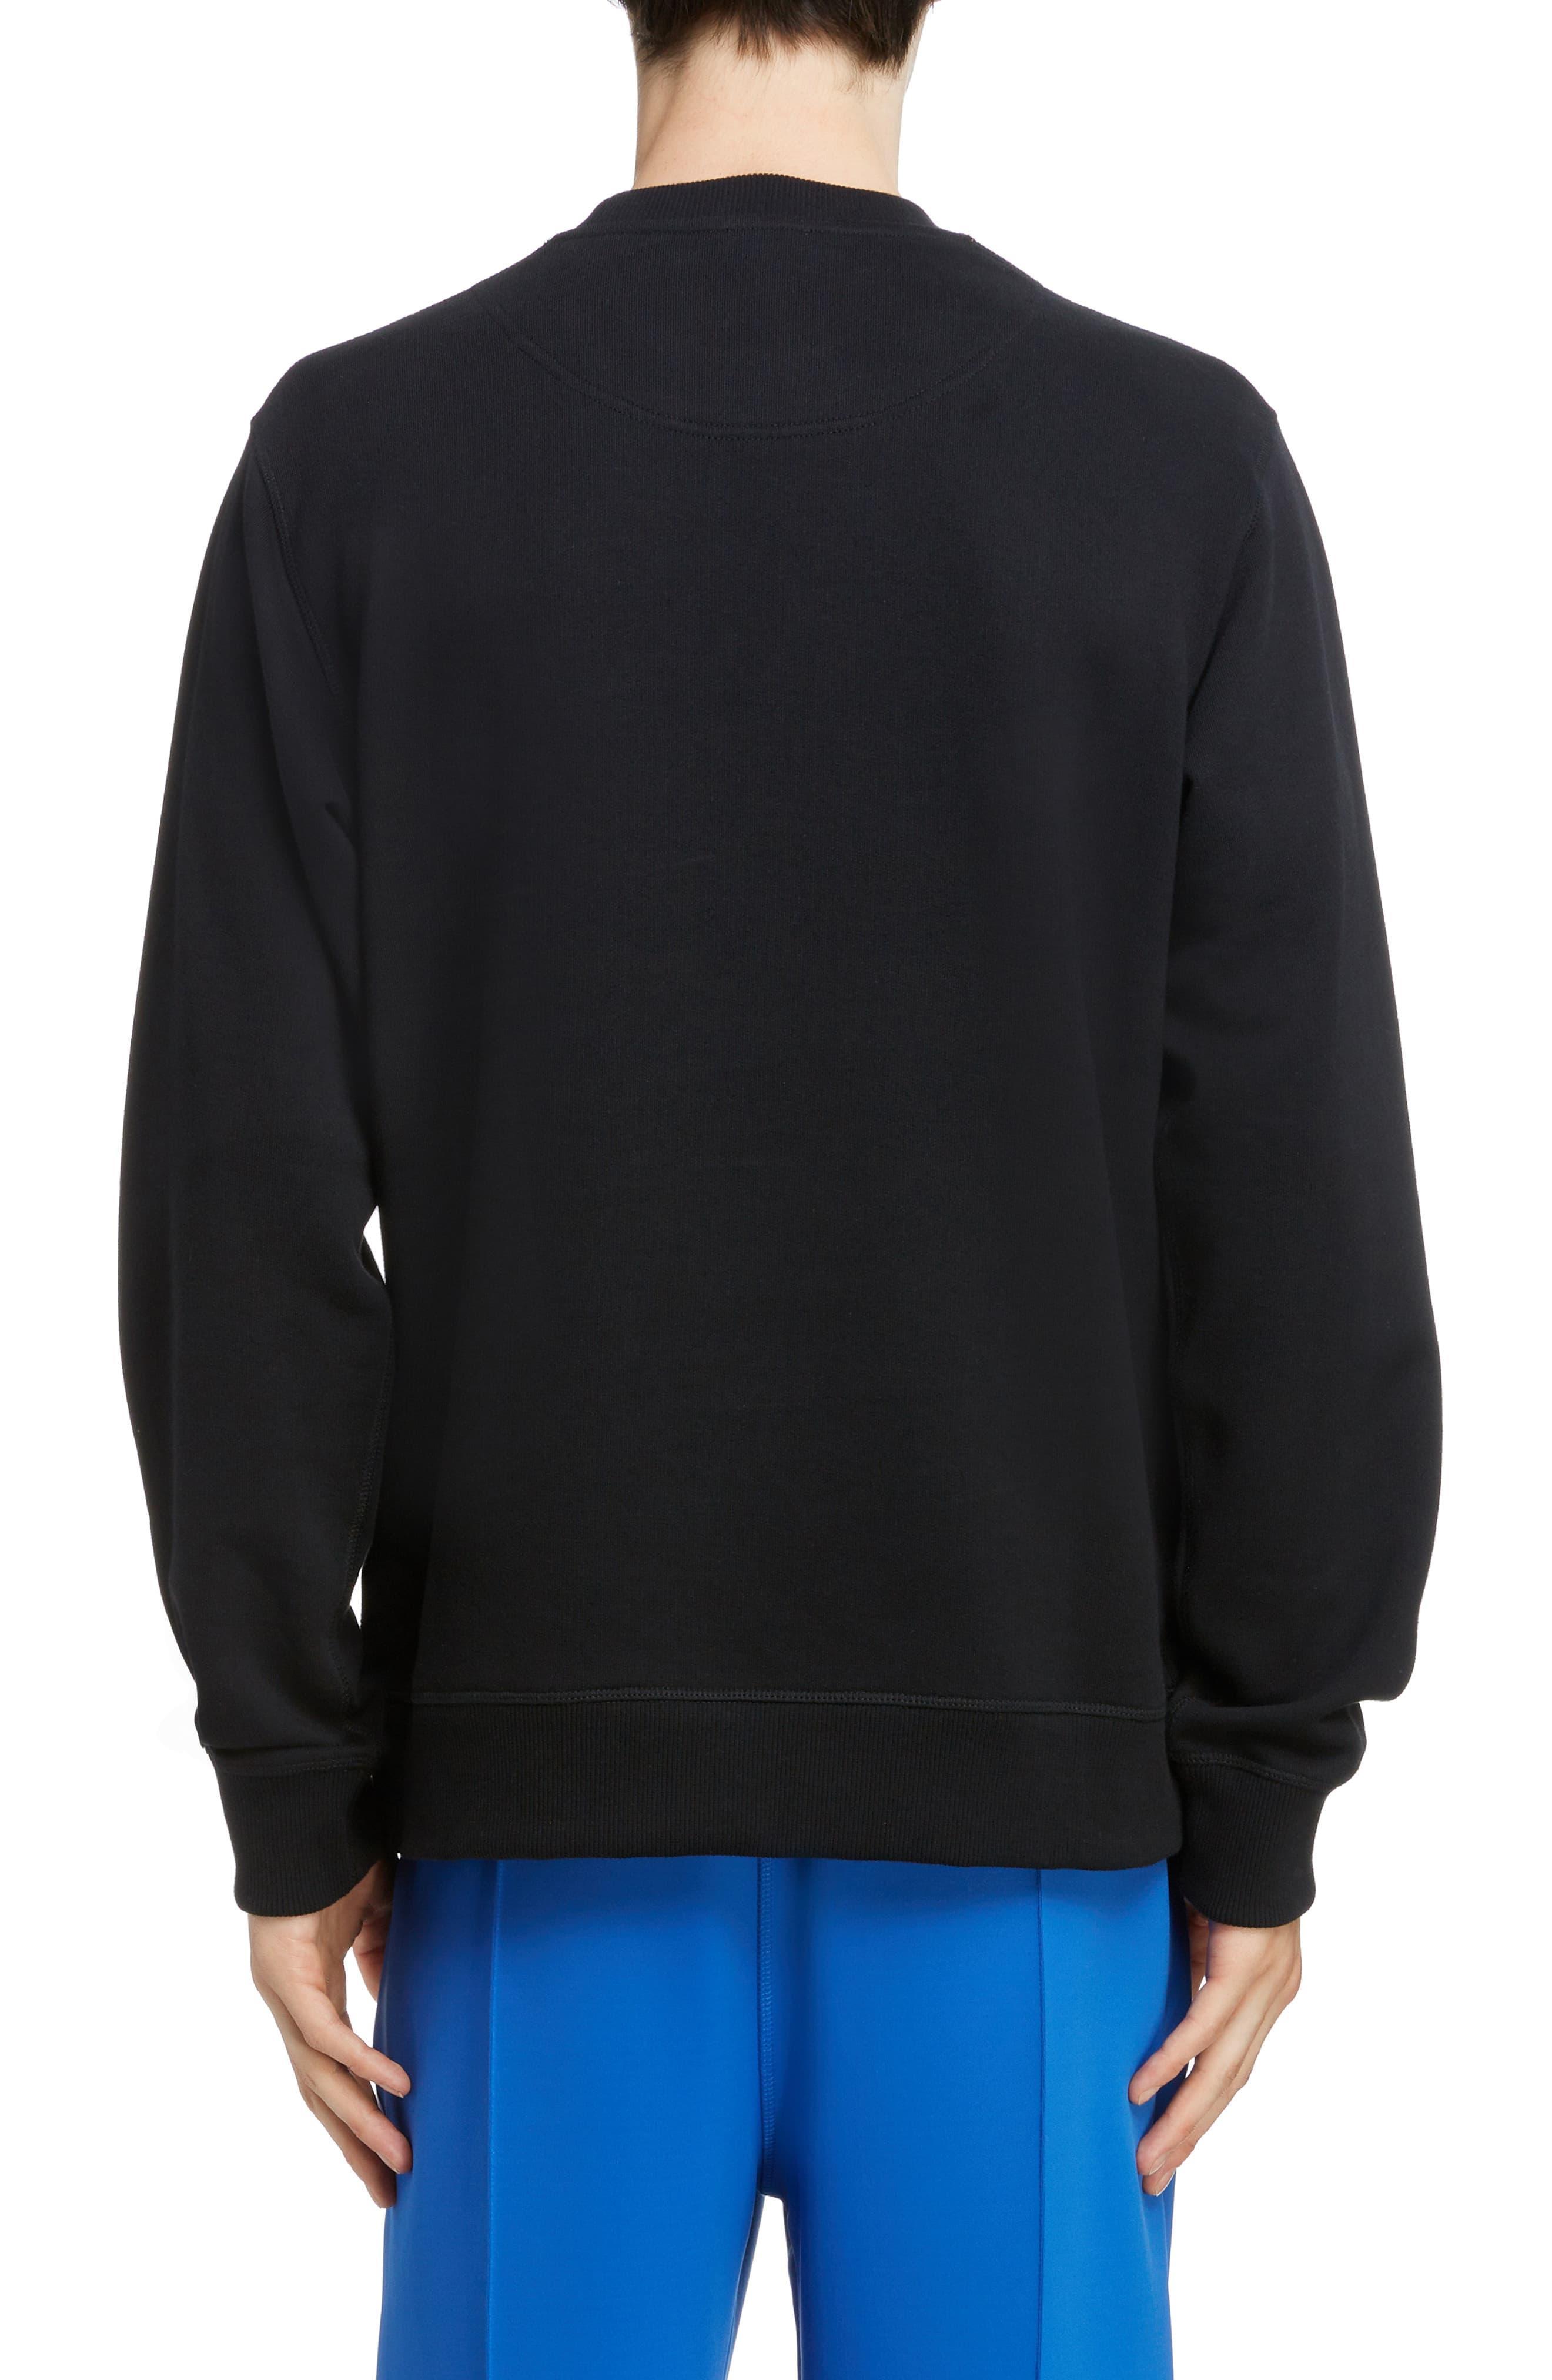 68e2b01e3 KENZO - Black Embroidered Eye Sweatshirt for Men - Lyst. View fullscreen